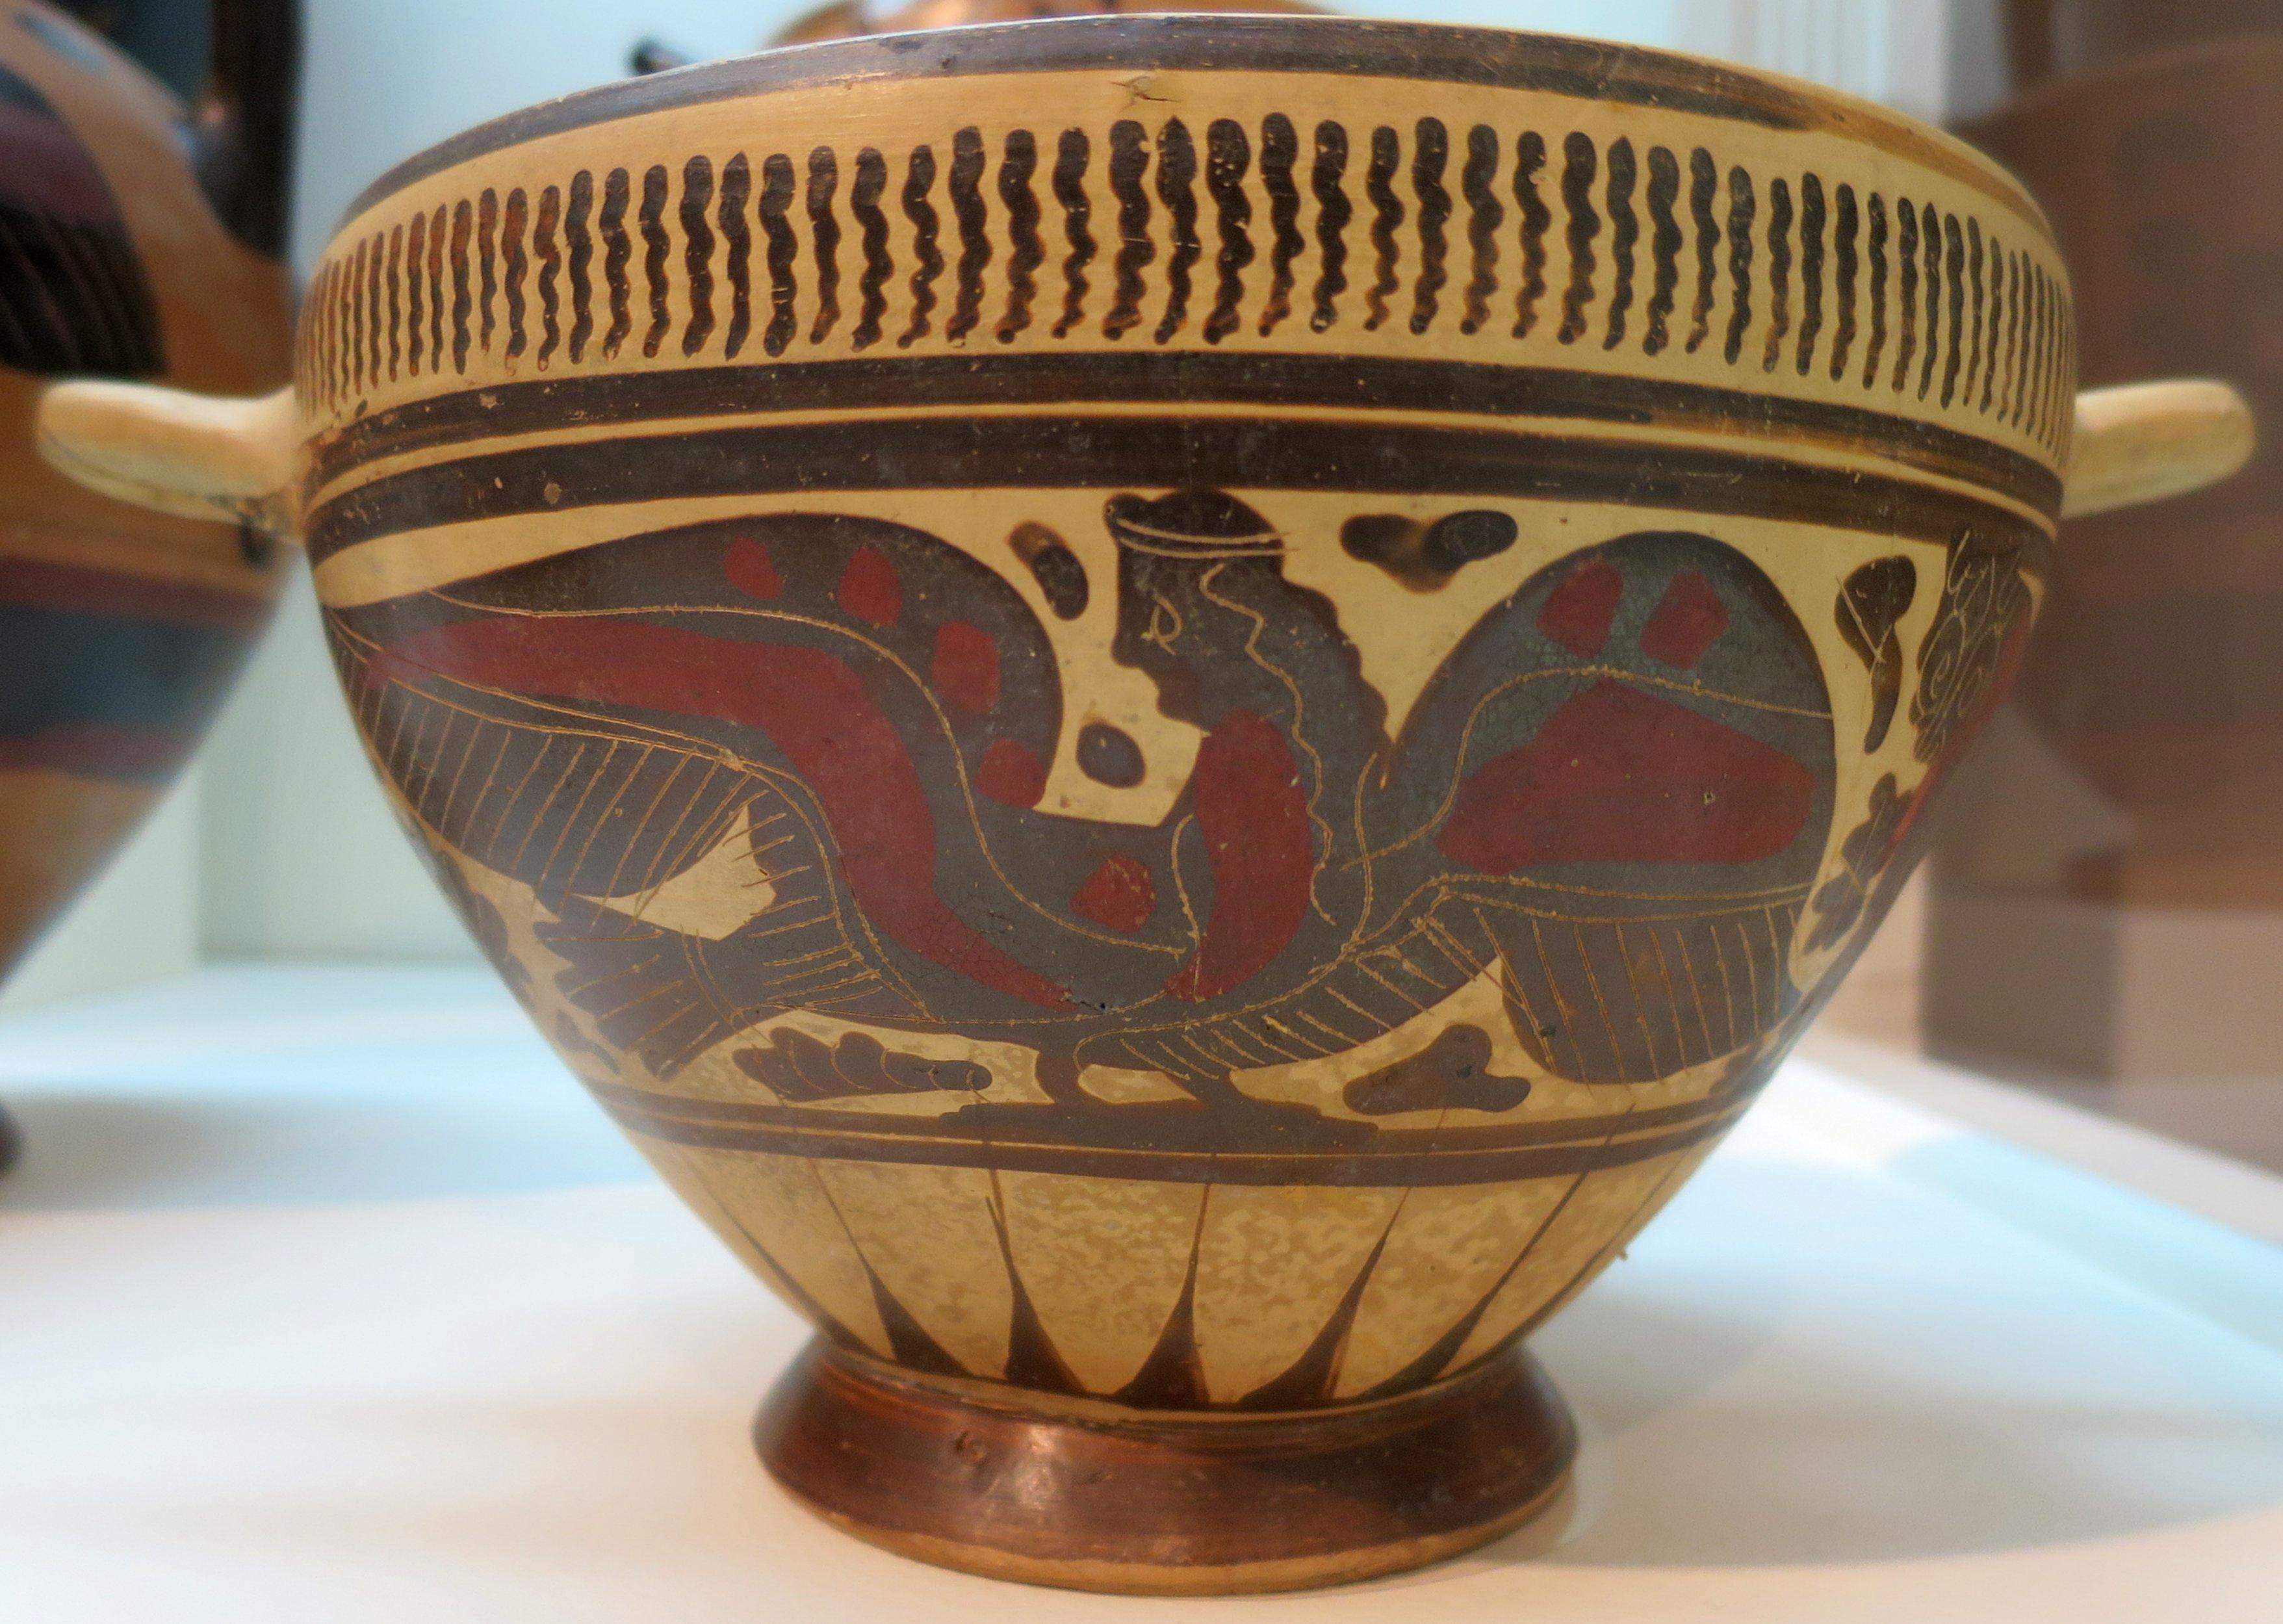 Datei:Skyphos by Miami Painter, c. 600-575 BCE, Lowe Art Museum I ...